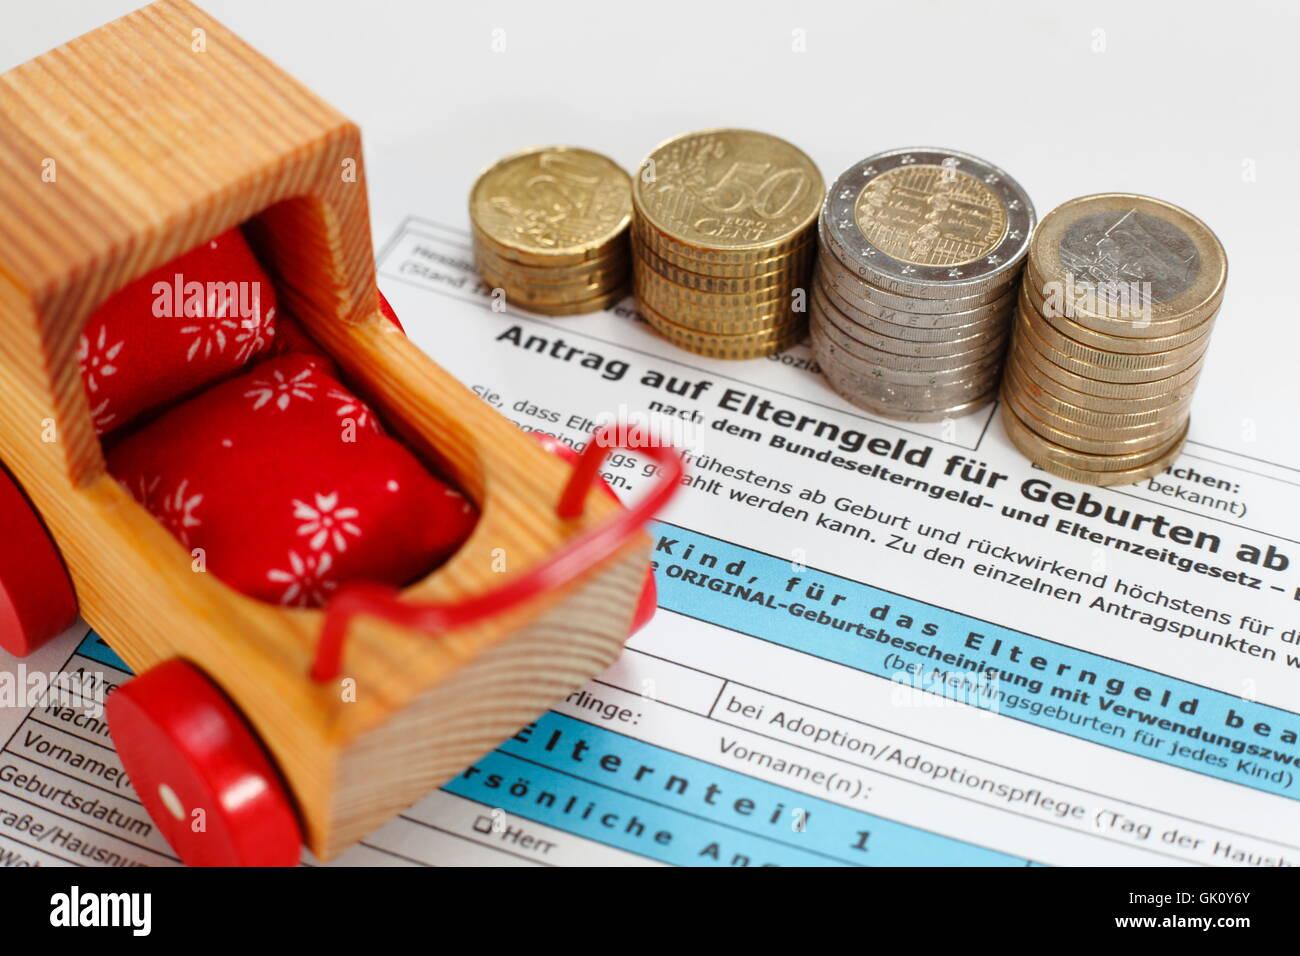 parental allowance request - Stock Image